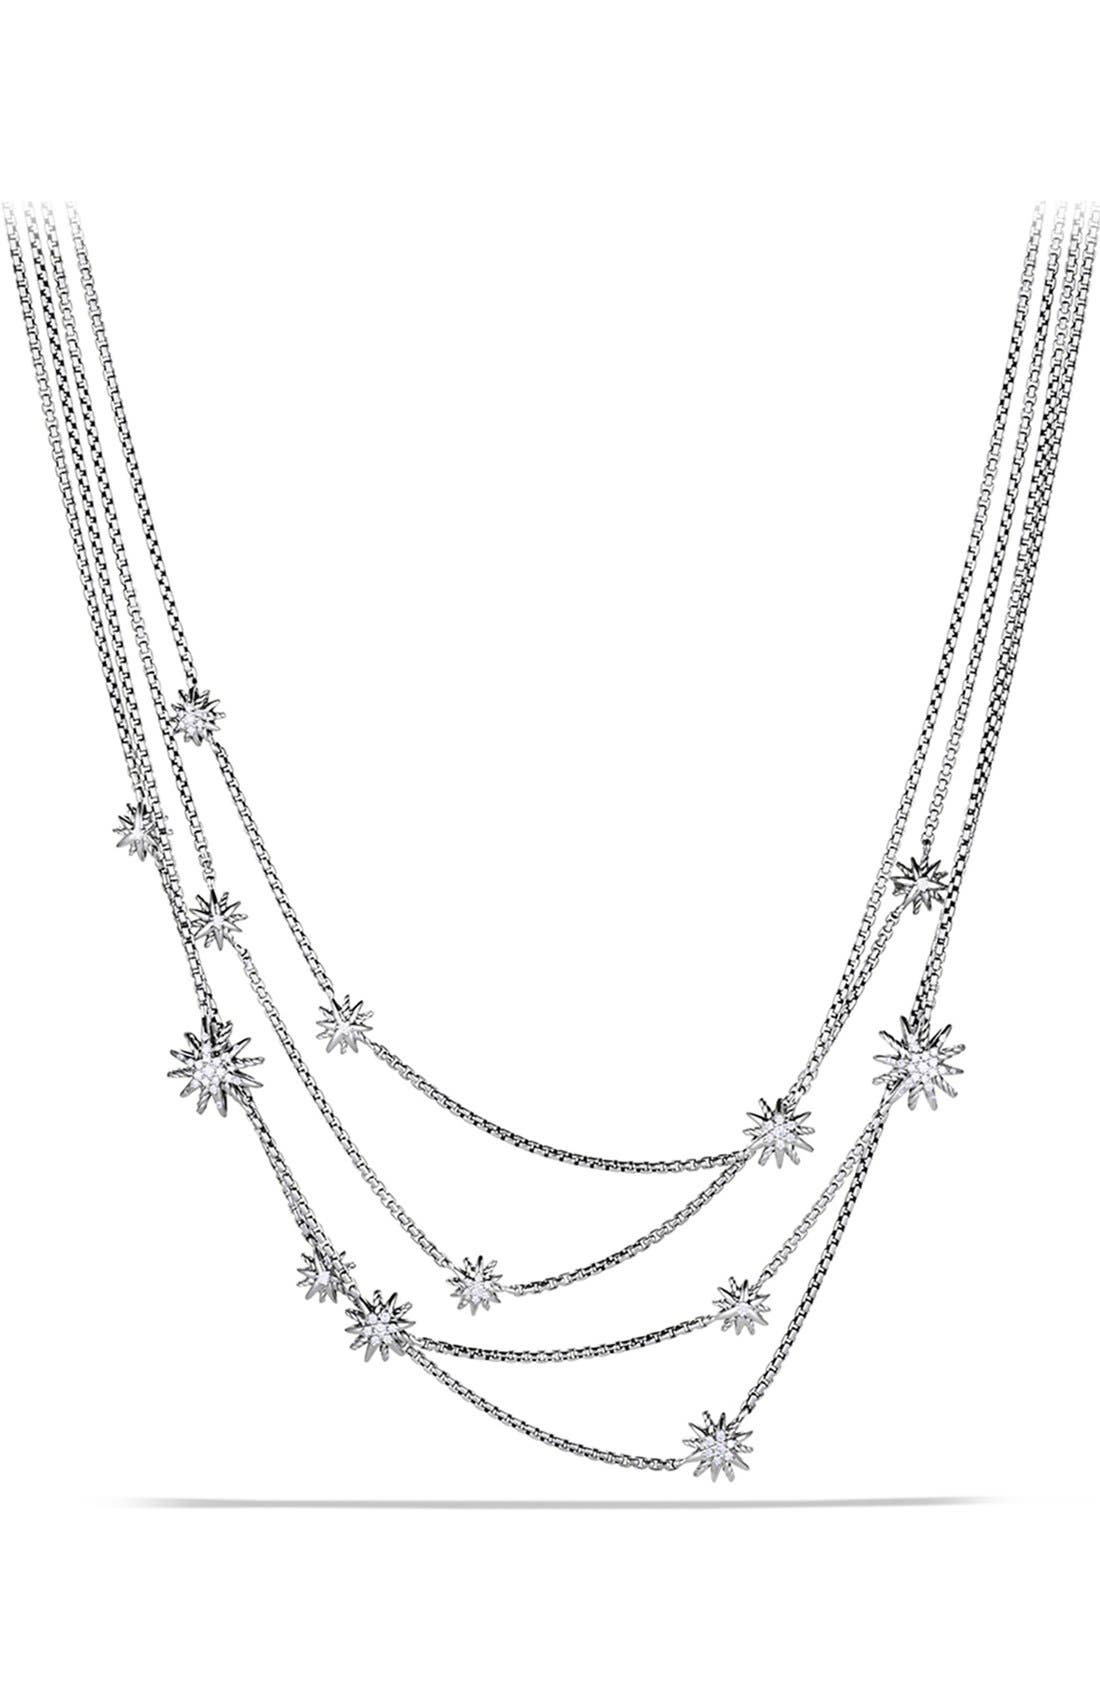 Main Image - David Yurman 'Starburst' Chain Necklace with Diamonds